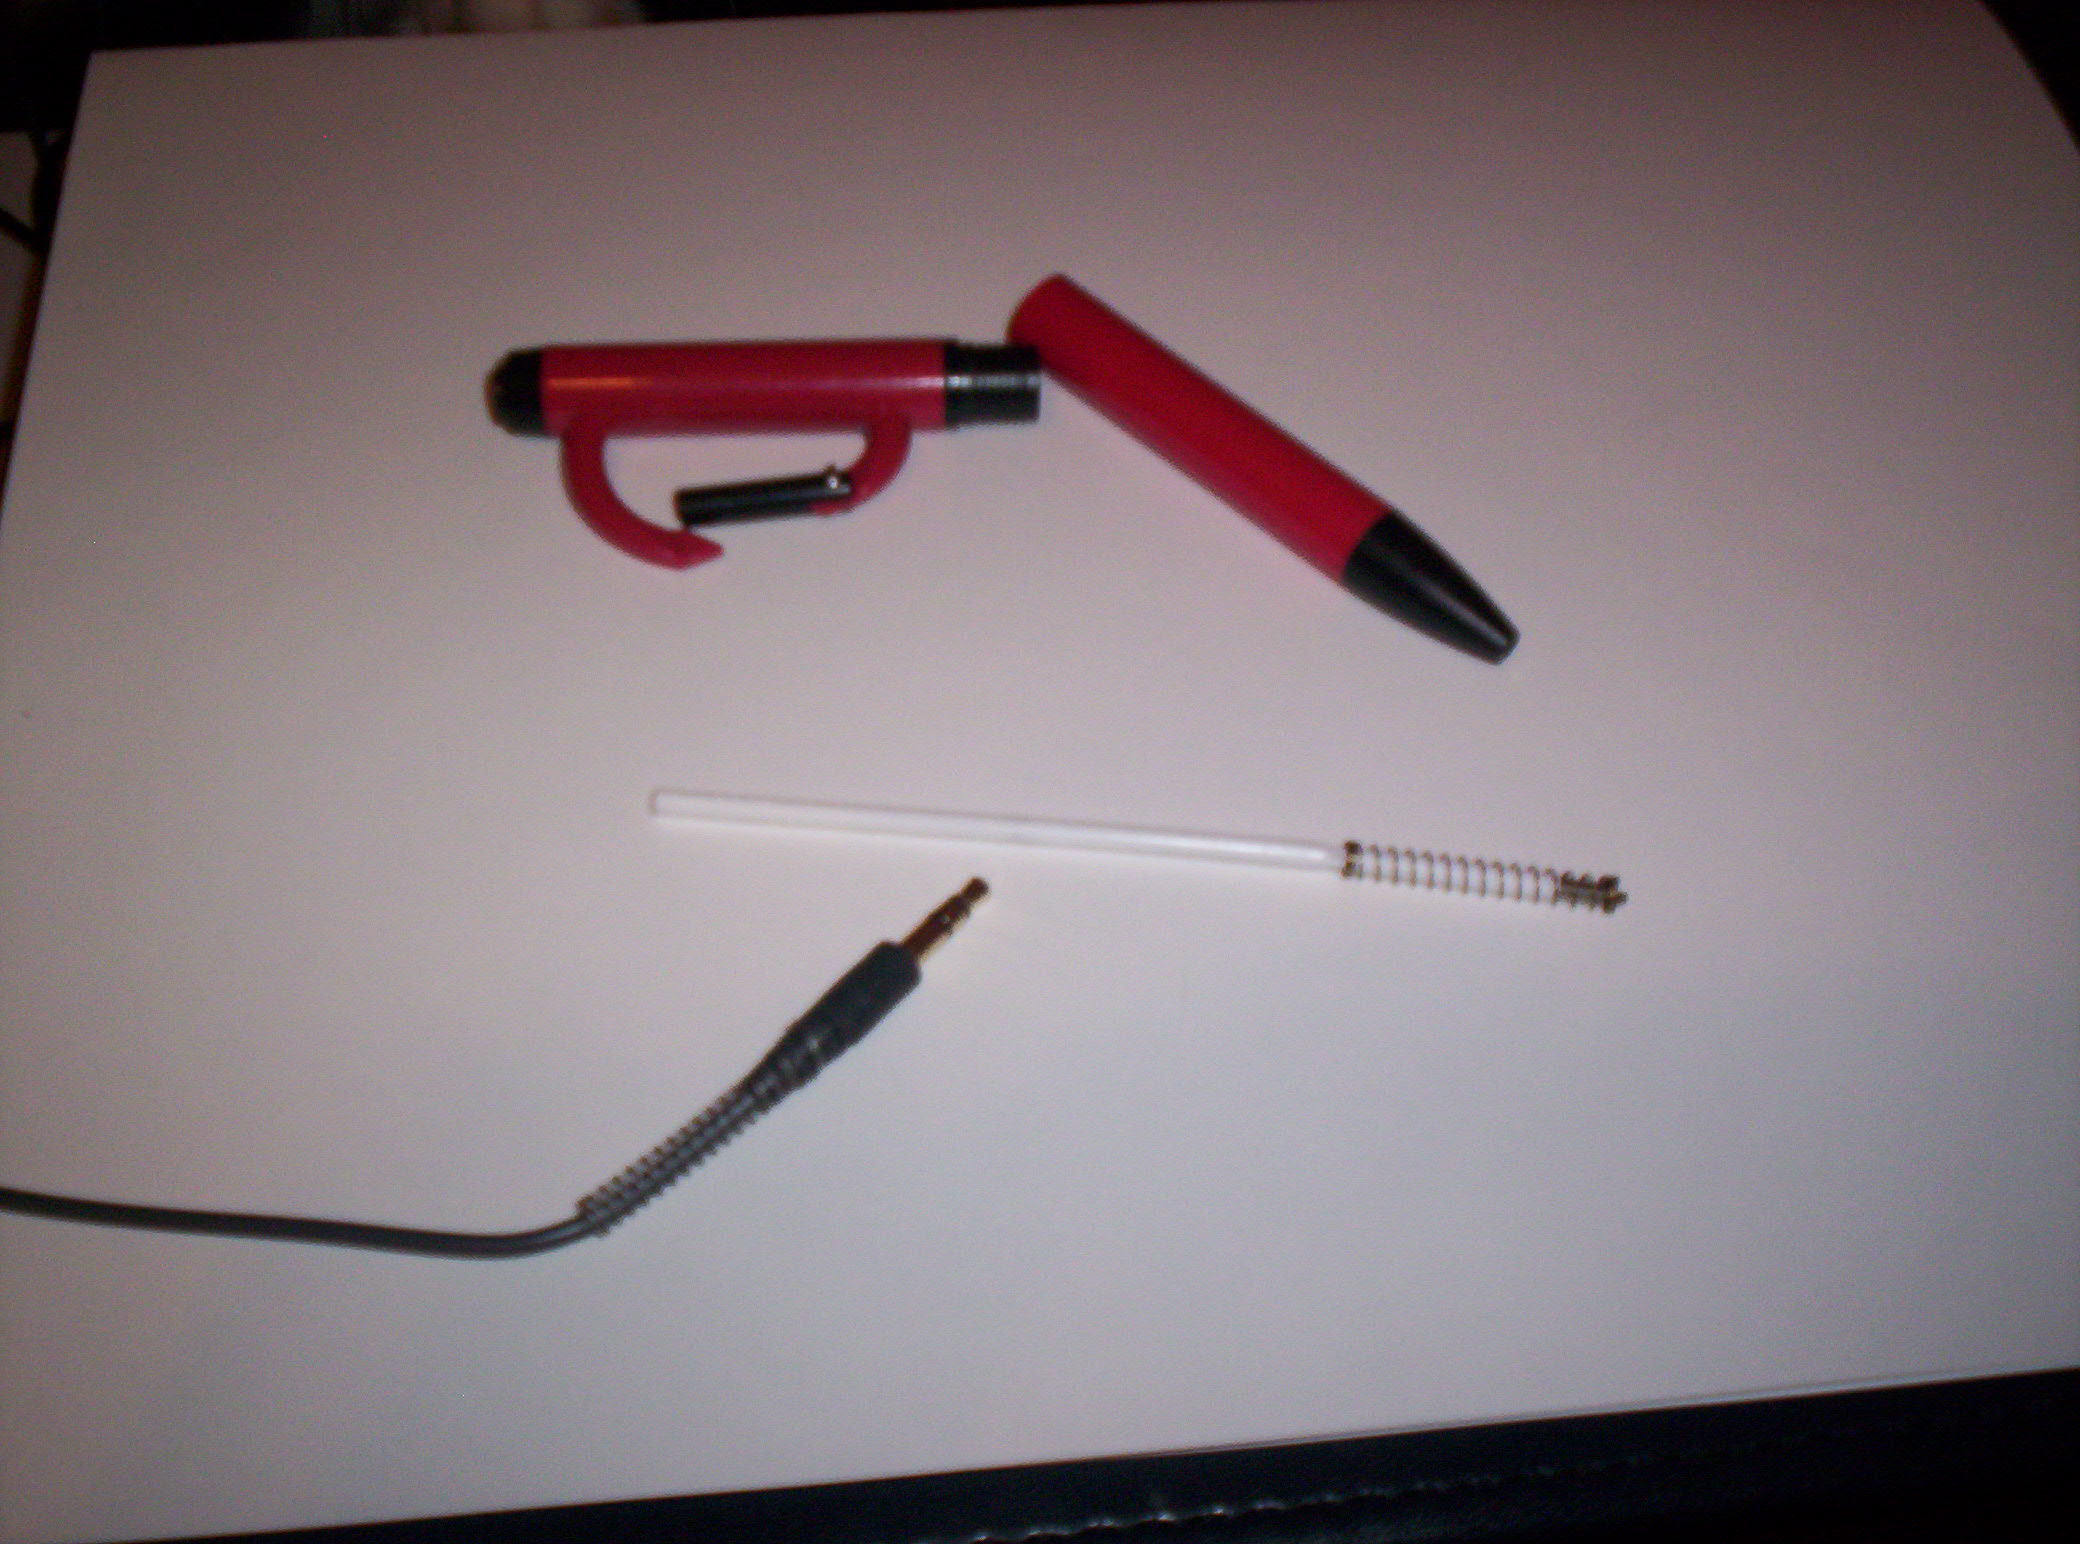 Headphone plug kink & break preventer